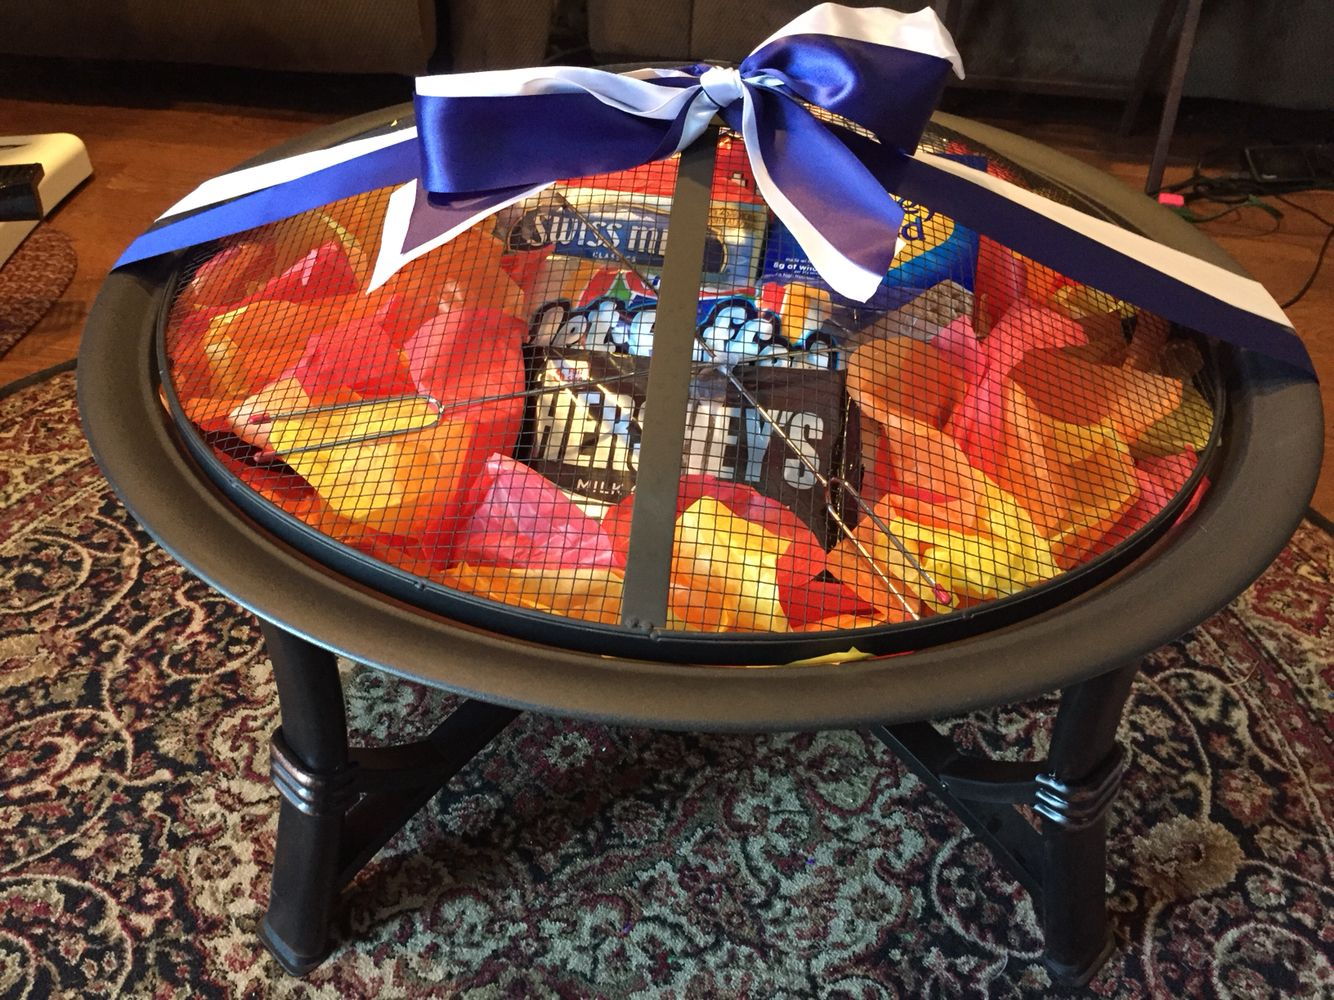 Fire pit s'more fundraiser badket | Fire pit gift basket ...